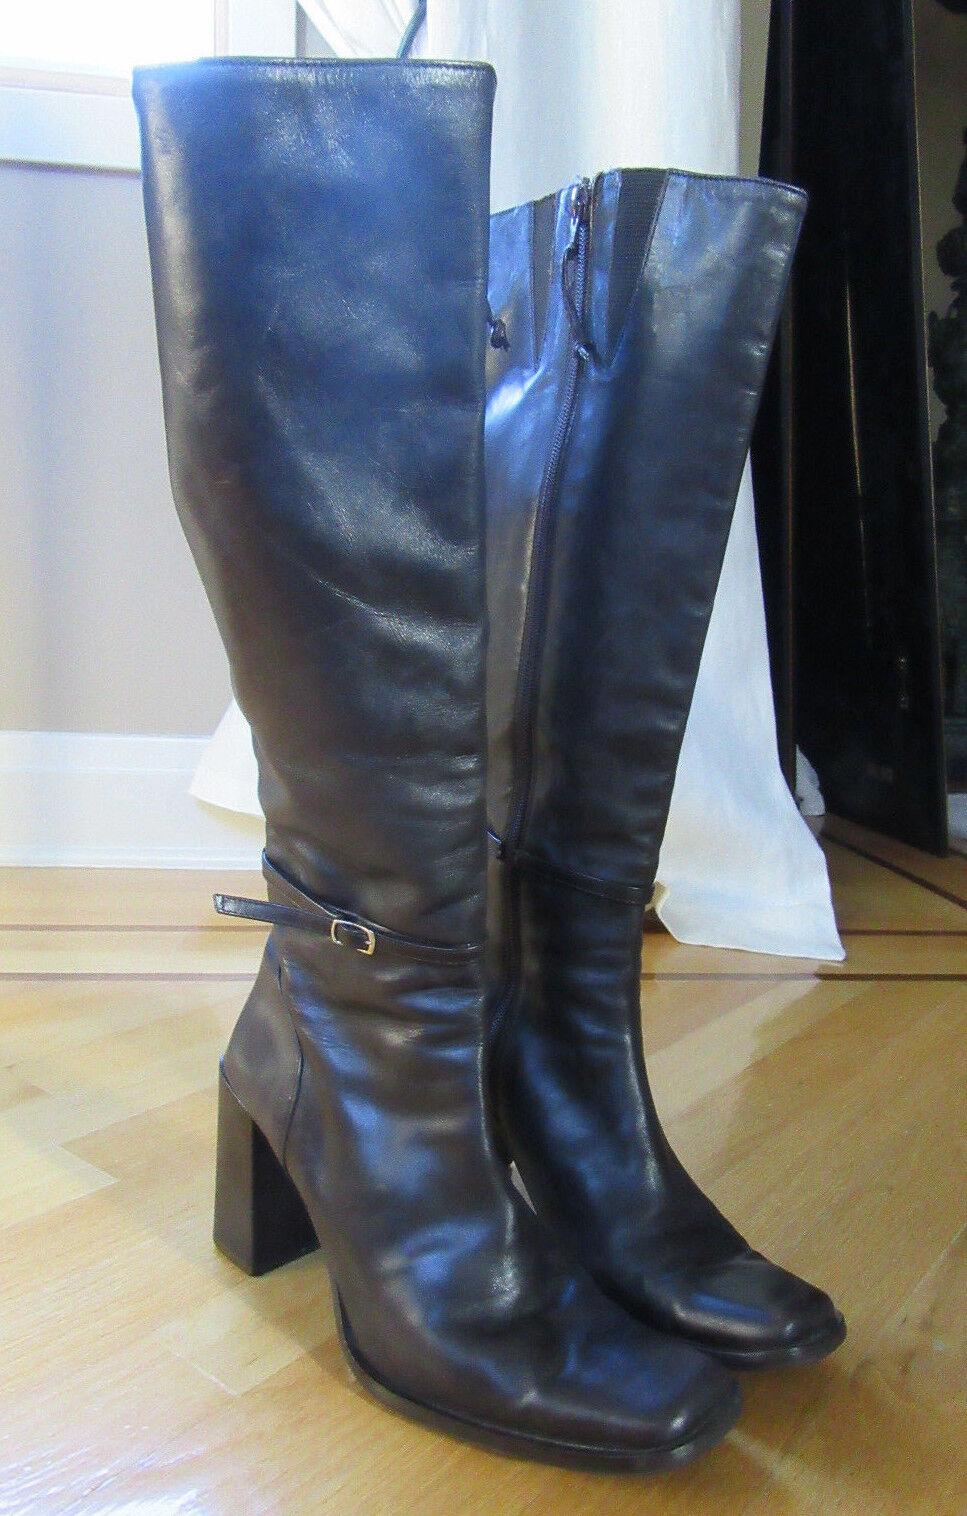 Donald J. Knee Pliner Dark Braun Leder Knee J. High Heel Stiefel Größe 8 M 1bcd4f